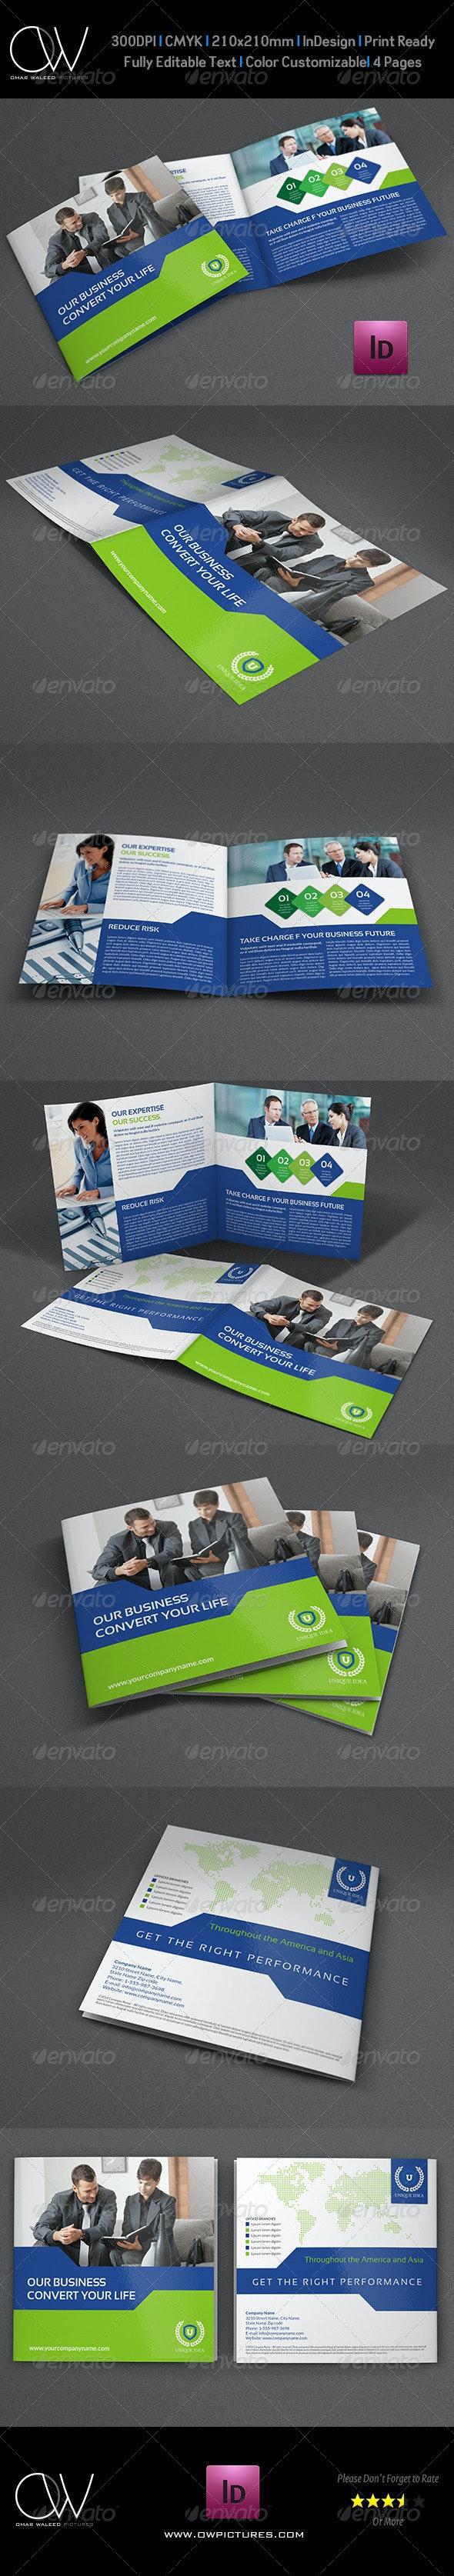 Company Brochure Bi-Fold Square Template Vol.25 - Corporate Brochures